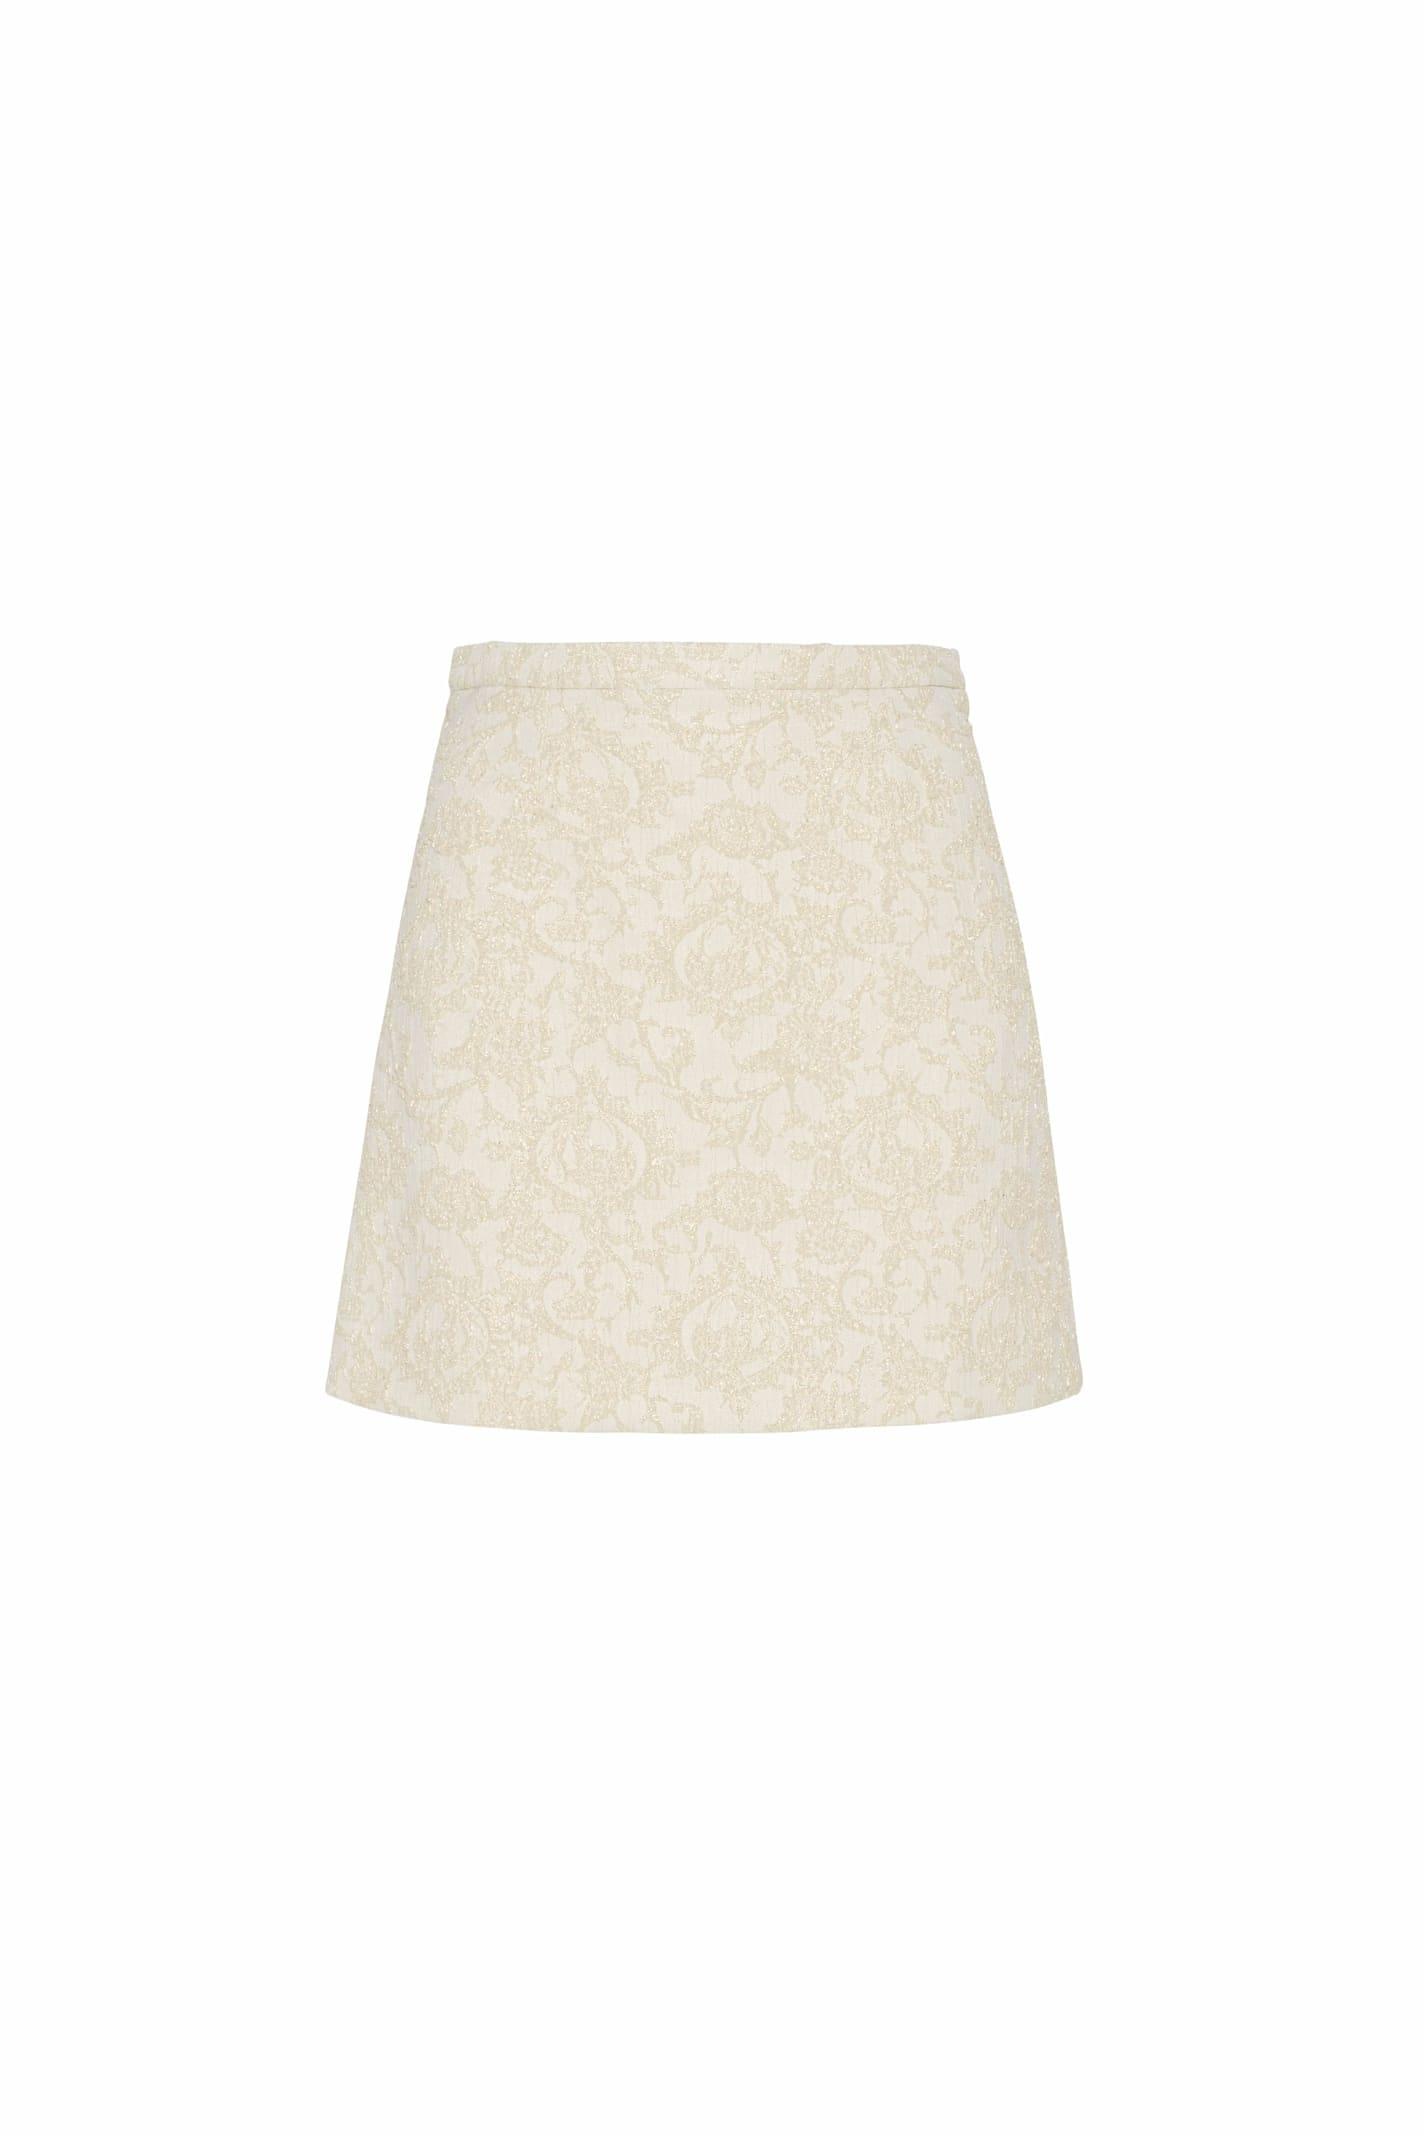 Baby Mini Skirt In Ivory Brocade